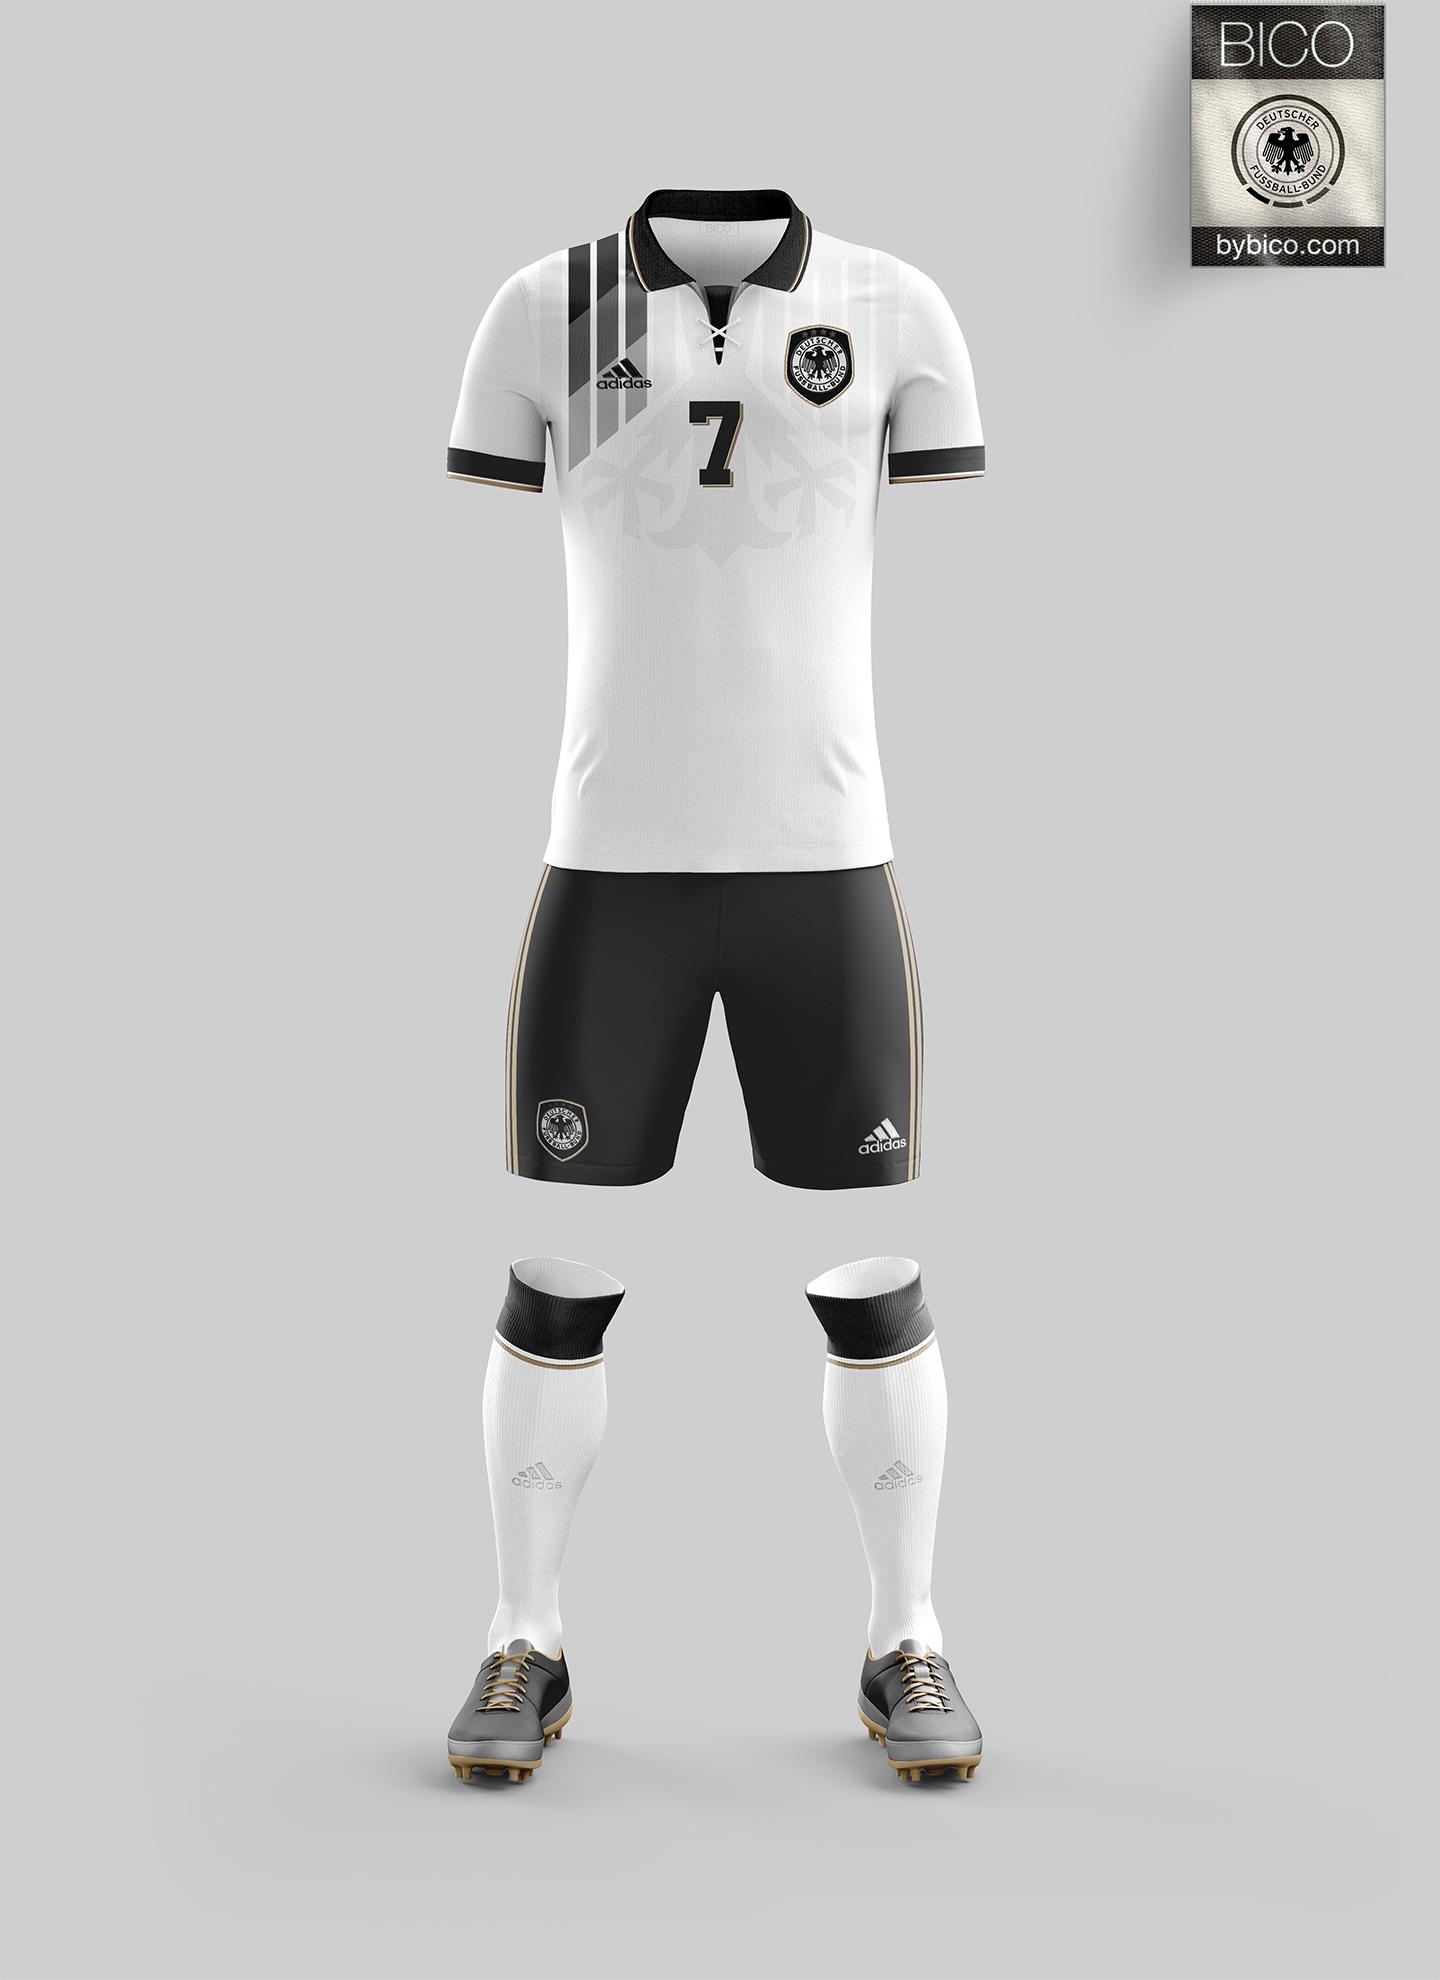 62ee3bccd869e Germany Kit - Die Mannschaft